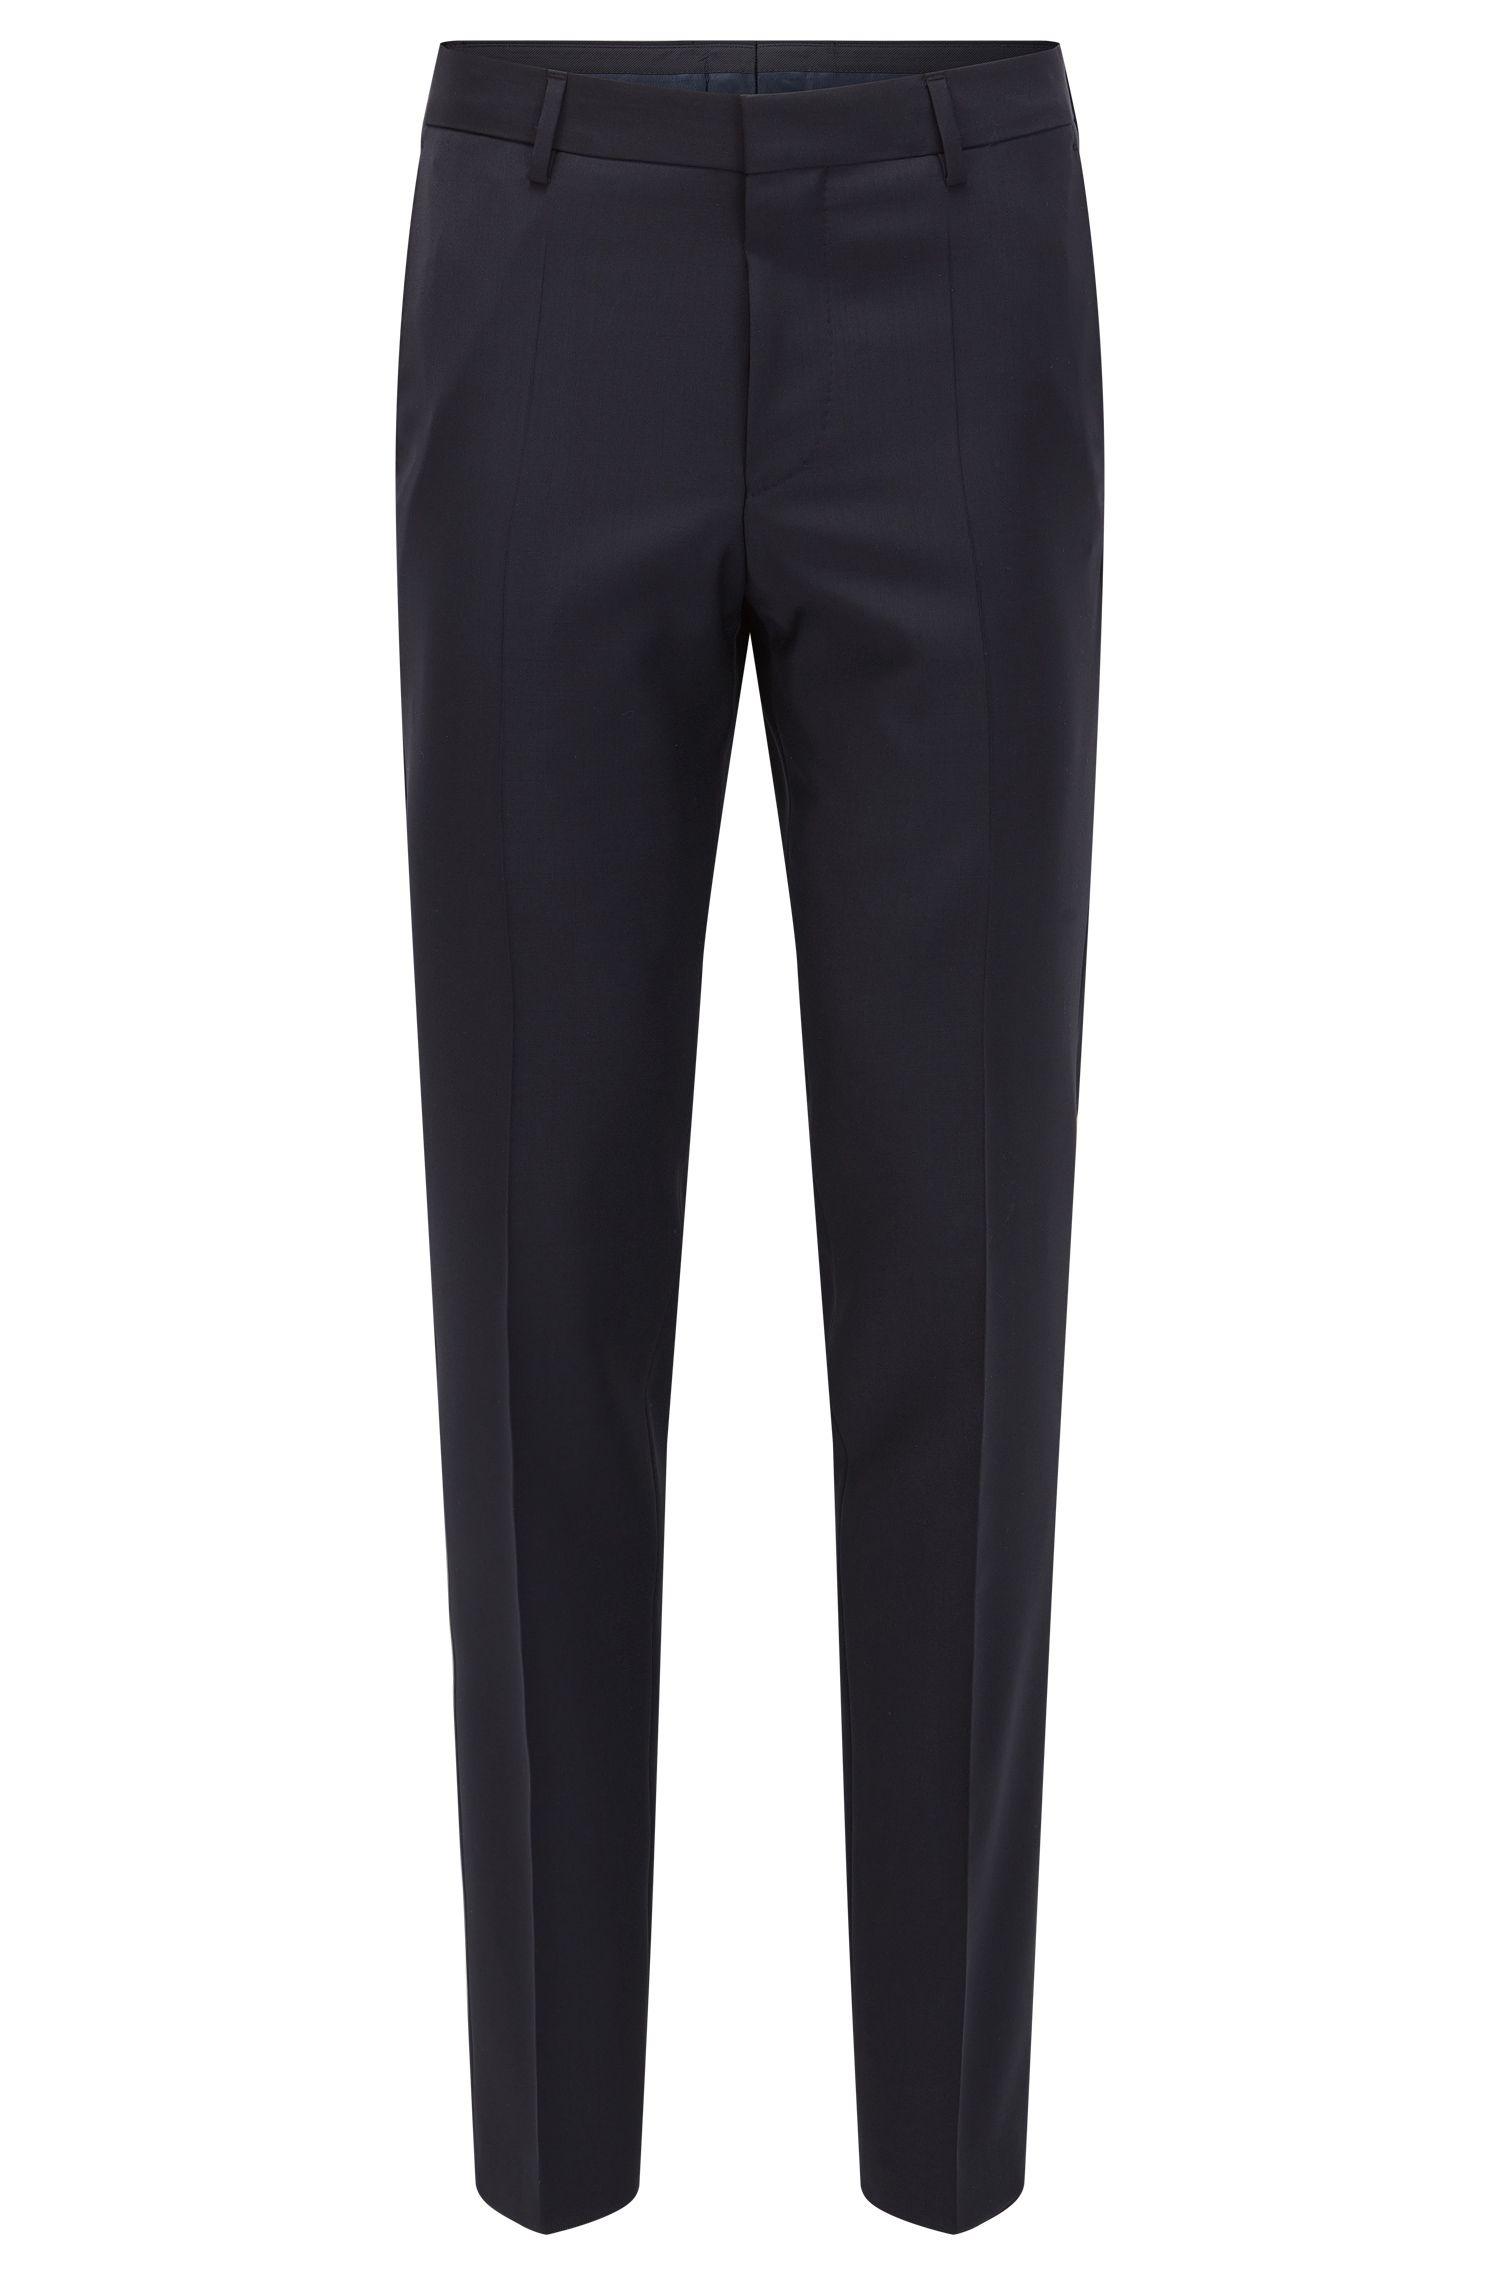 Virgin Wool Cashmere Dress Pants, Slim Fit | Benso